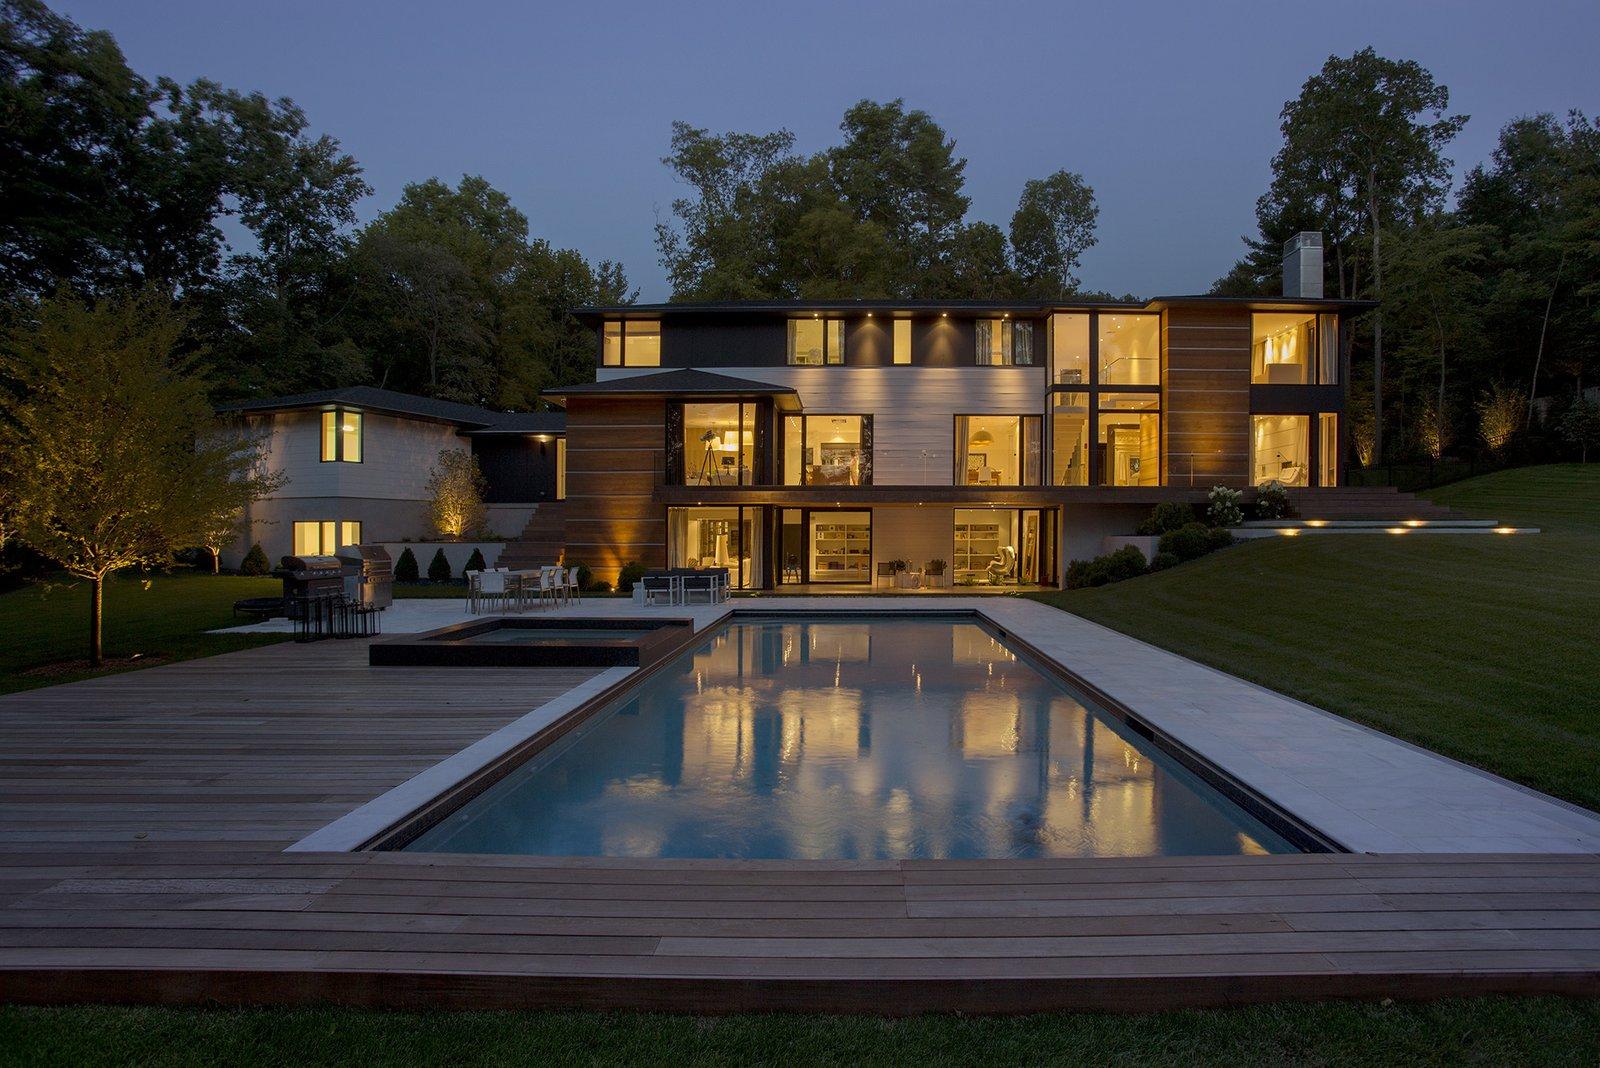 Ledgewood- Rear Exterior  Ledgewood by LDa  Architecture & Interiors